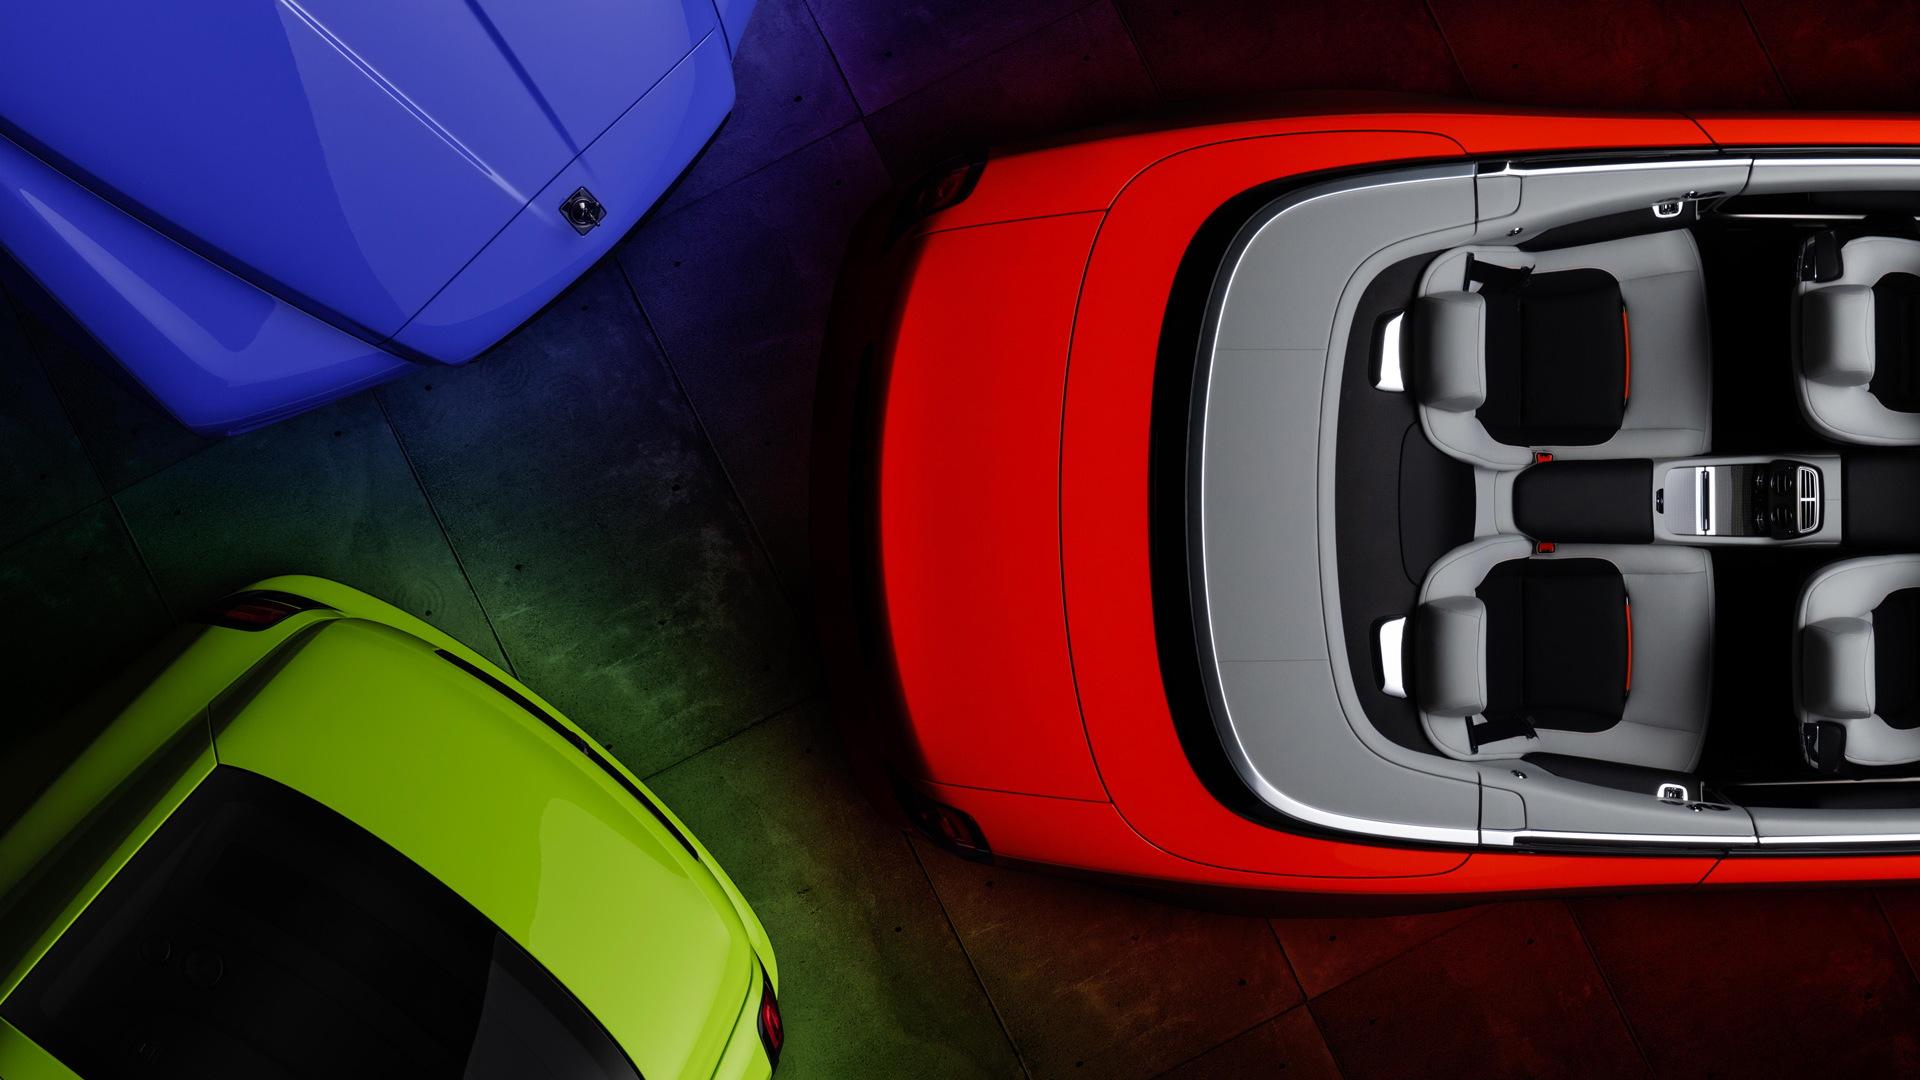 Rolls-Royce Black Badge Neon Nights editions